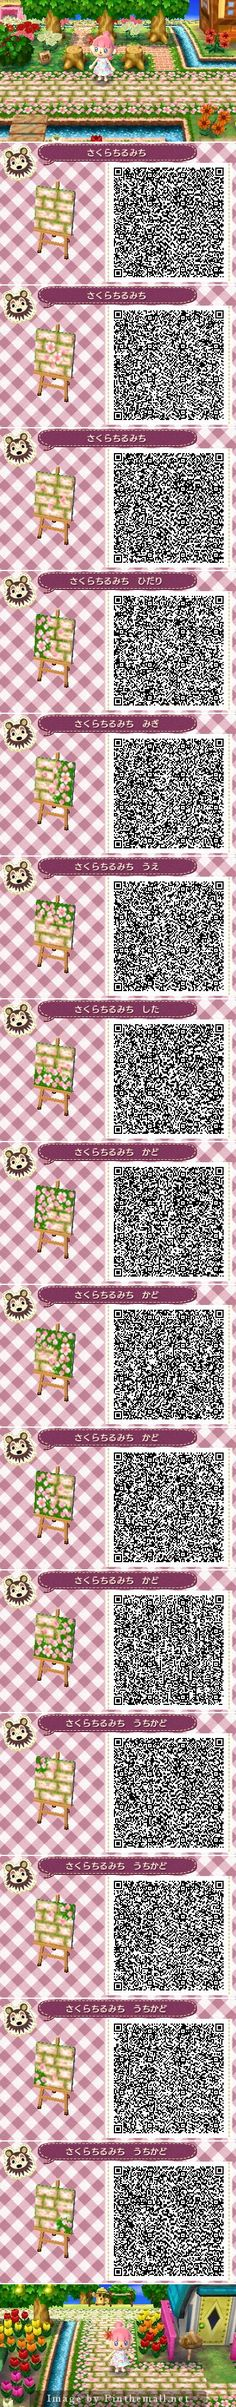 QR path: Sakura blossom bordered brick path